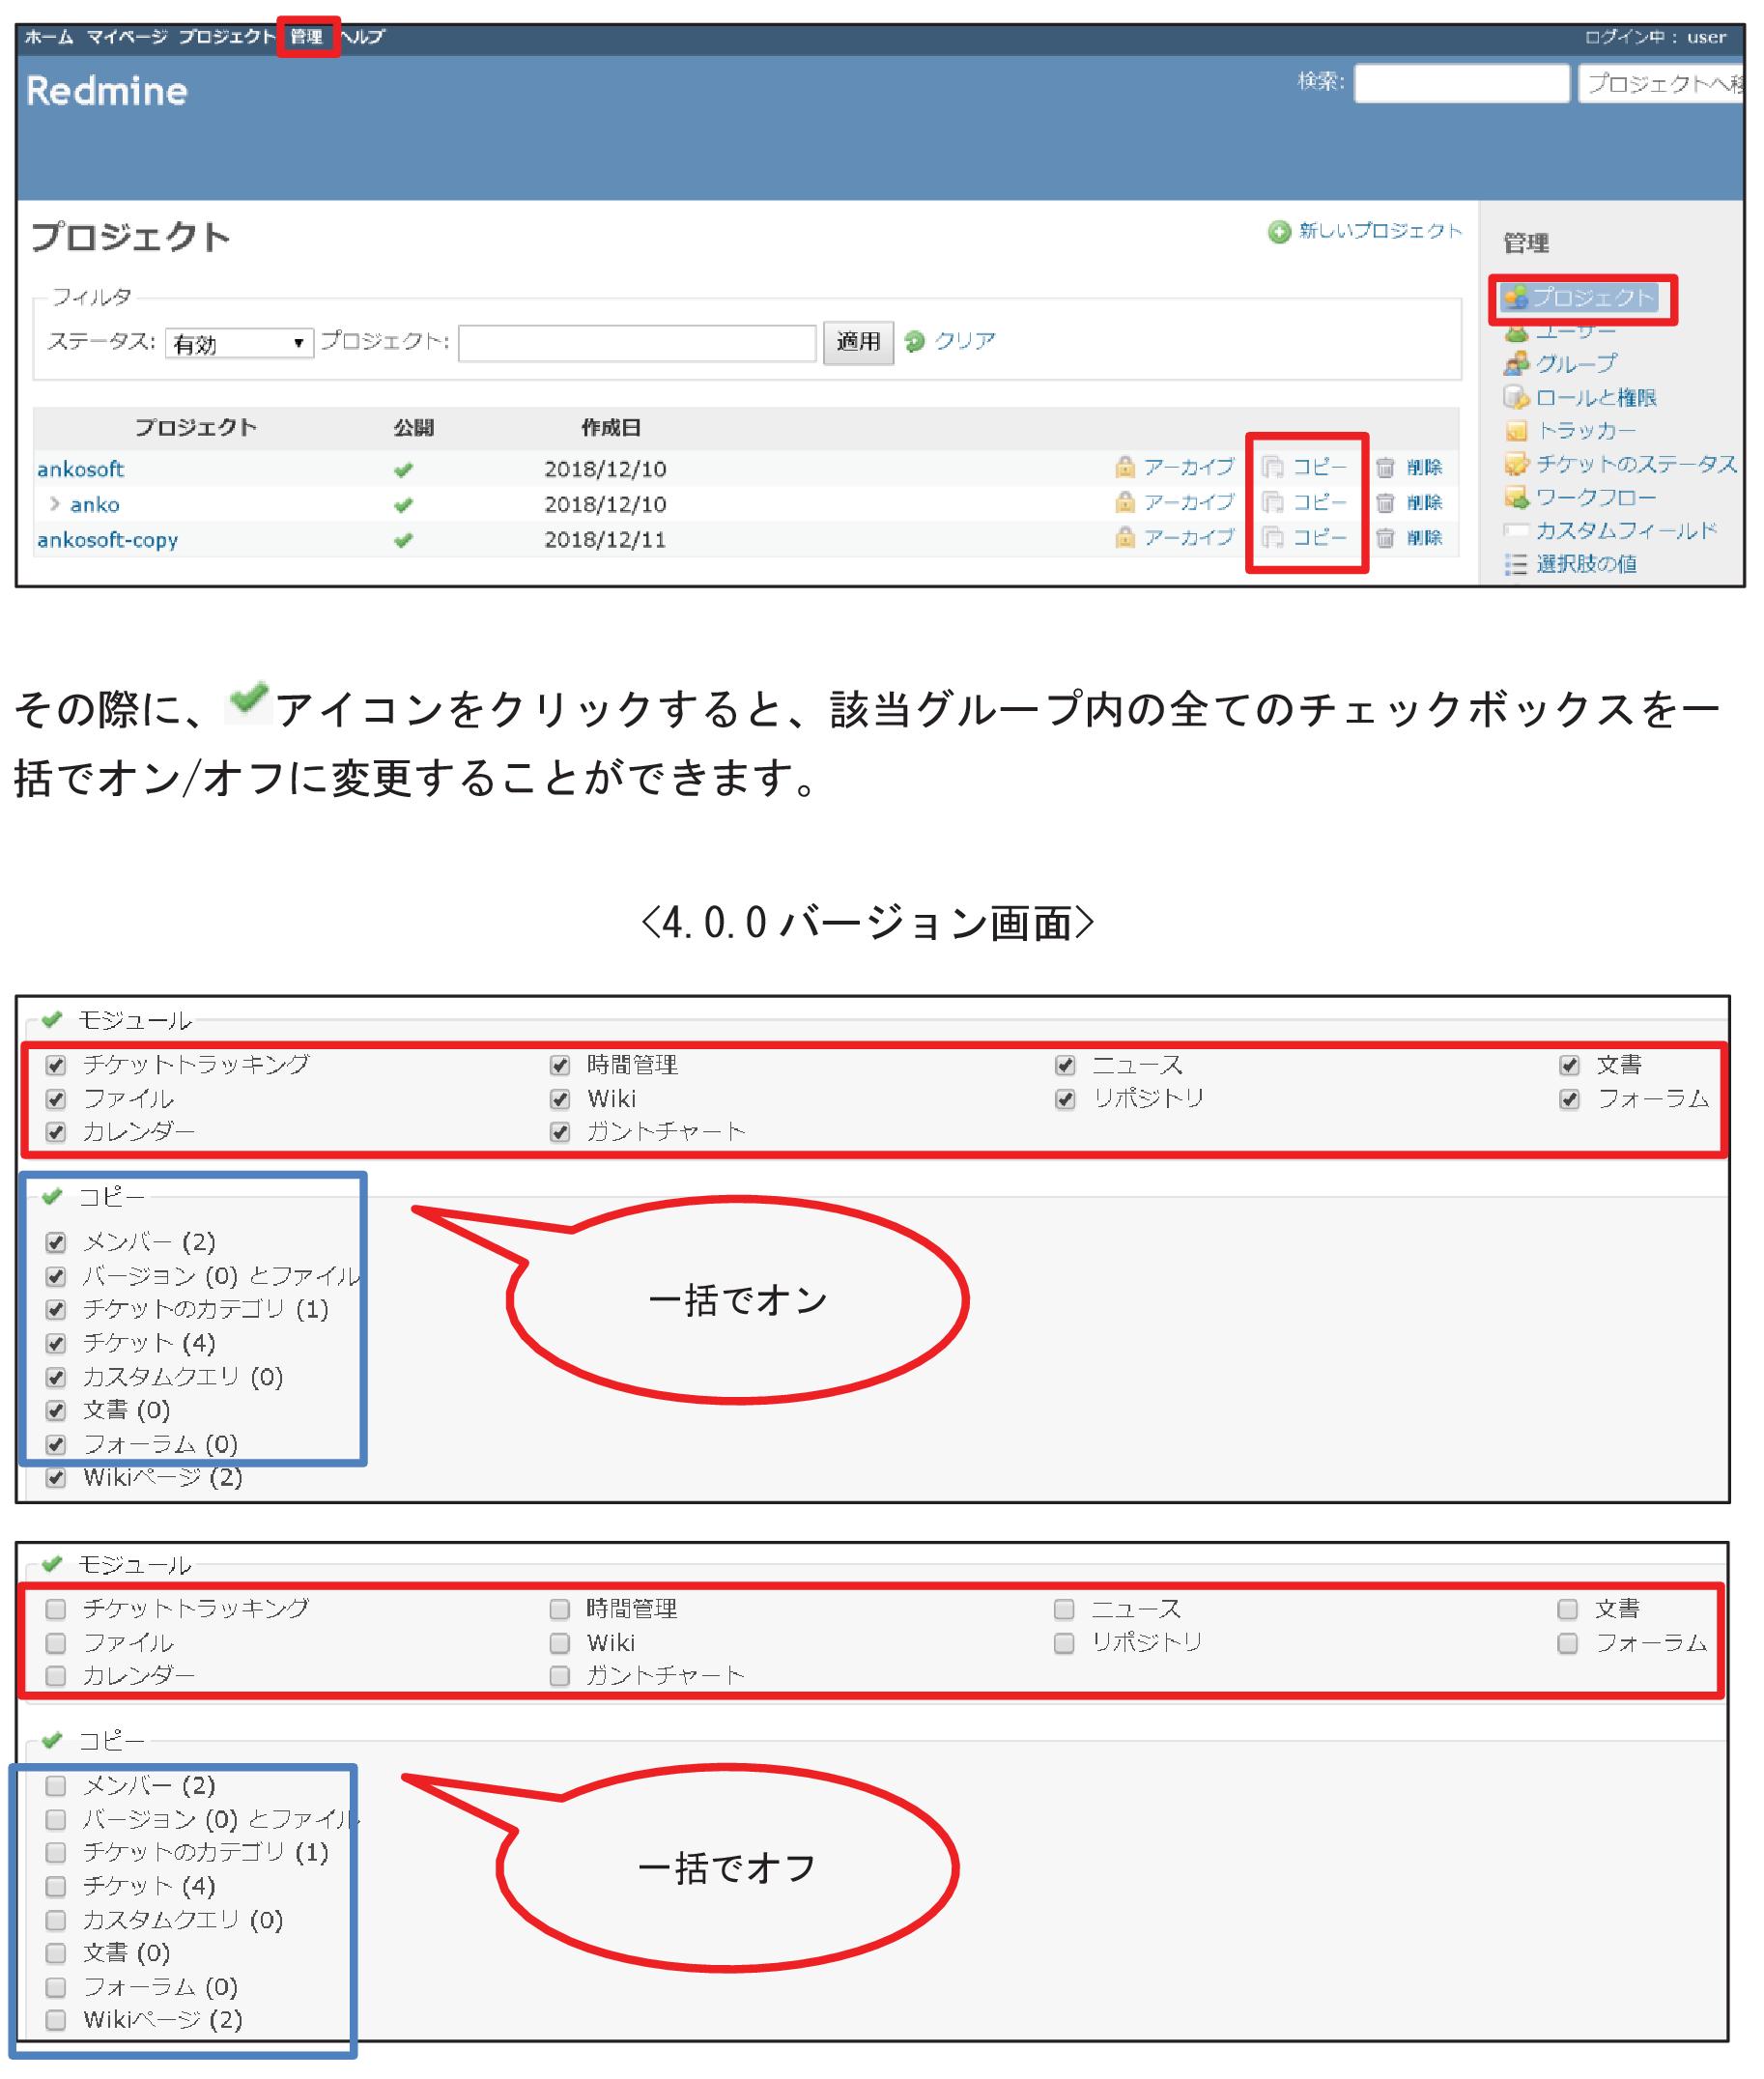 Ankosoft Redmine Jenkins SVN ALM PMS | Redmine4.0.0 新機能のご紹介(3)